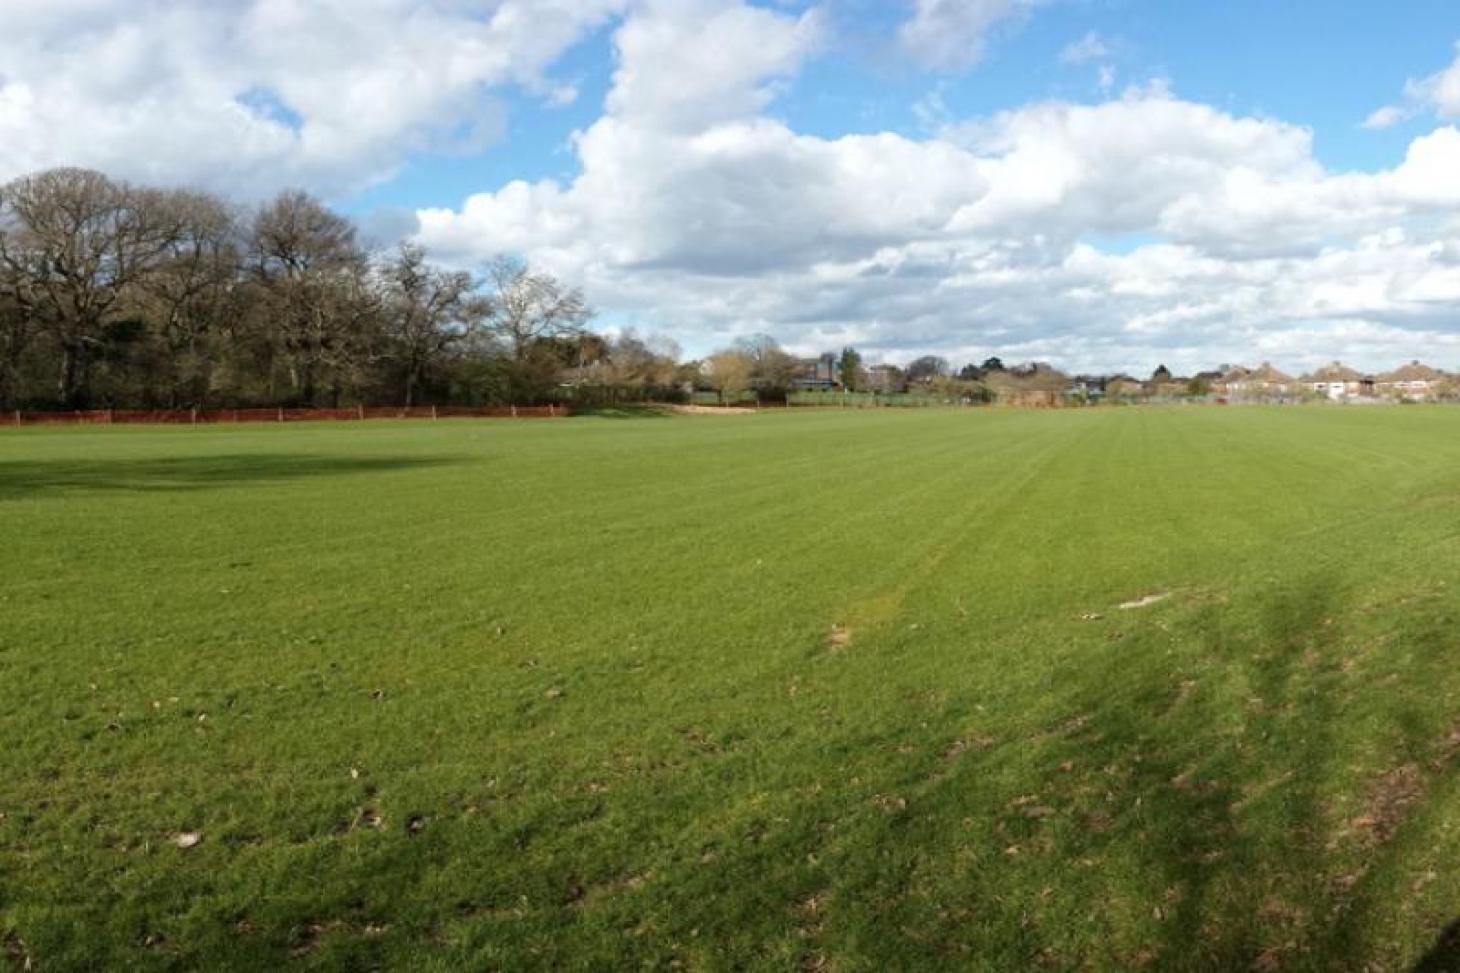 Chislehurst Recreation Ground 11 a side | Grass football pitch